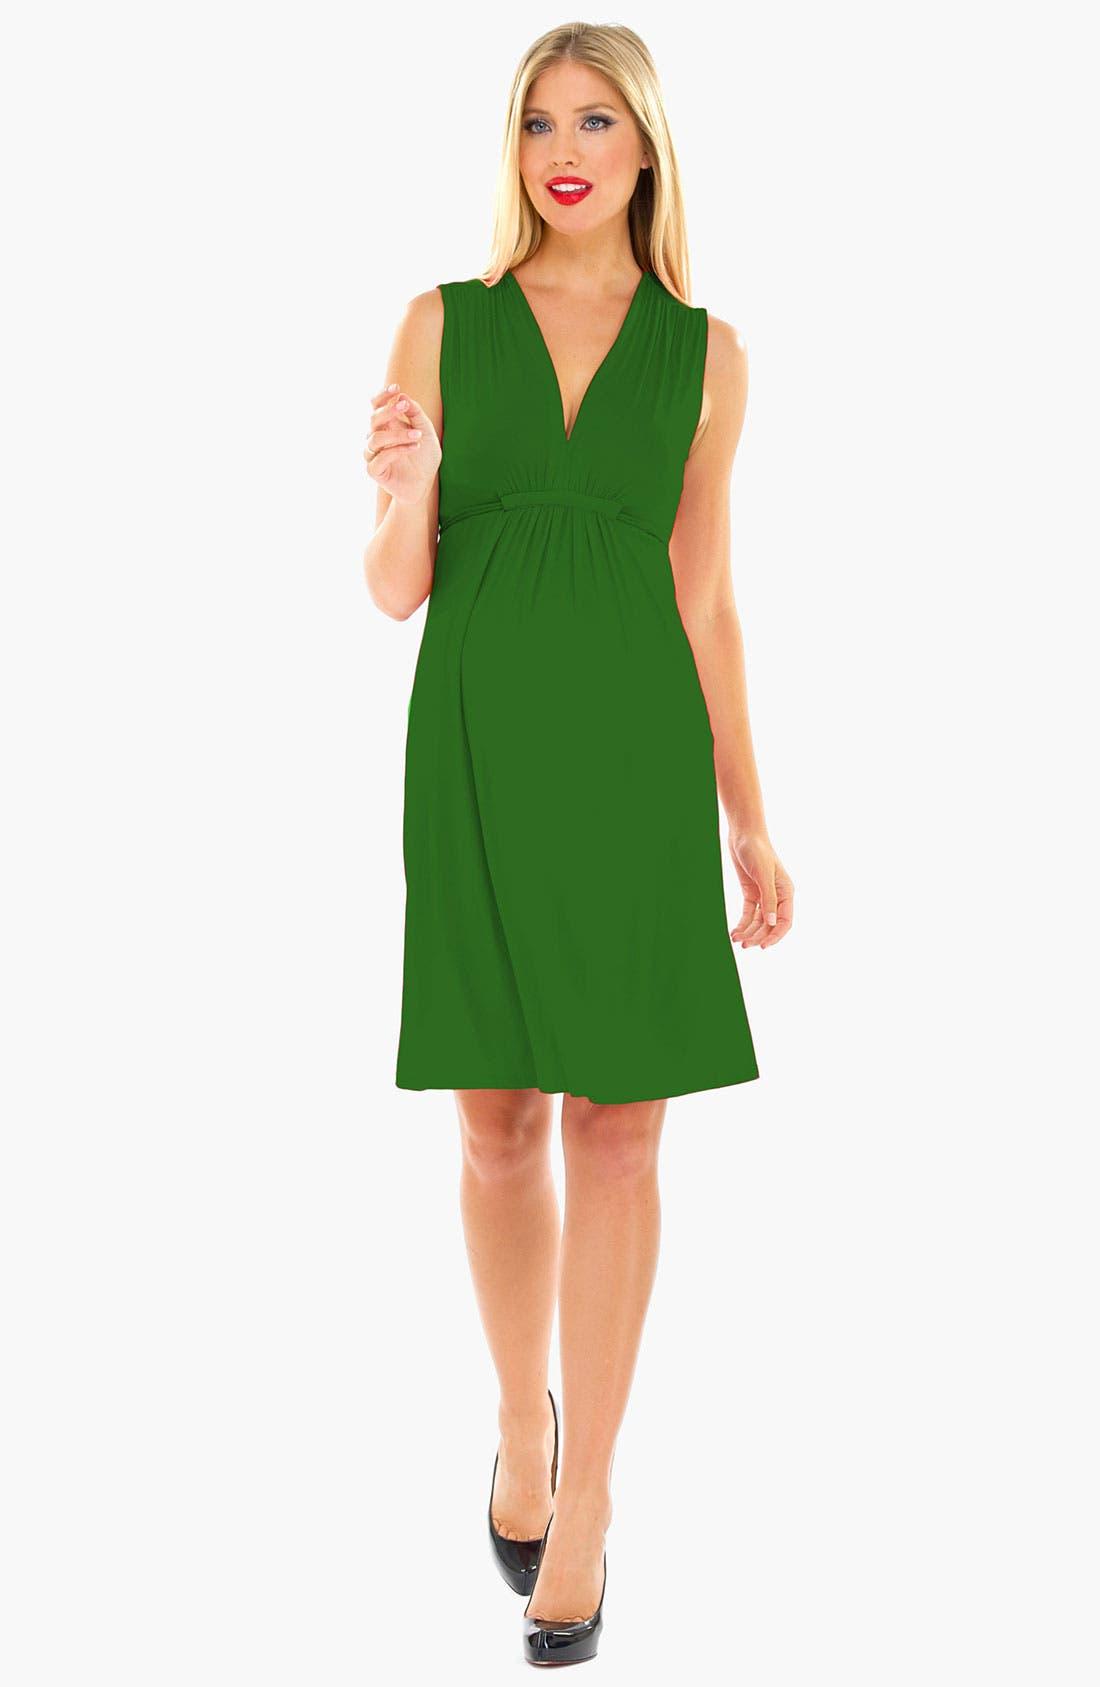 Alternate Image 1 Selected - Olian Sleeveless Maternity Dress